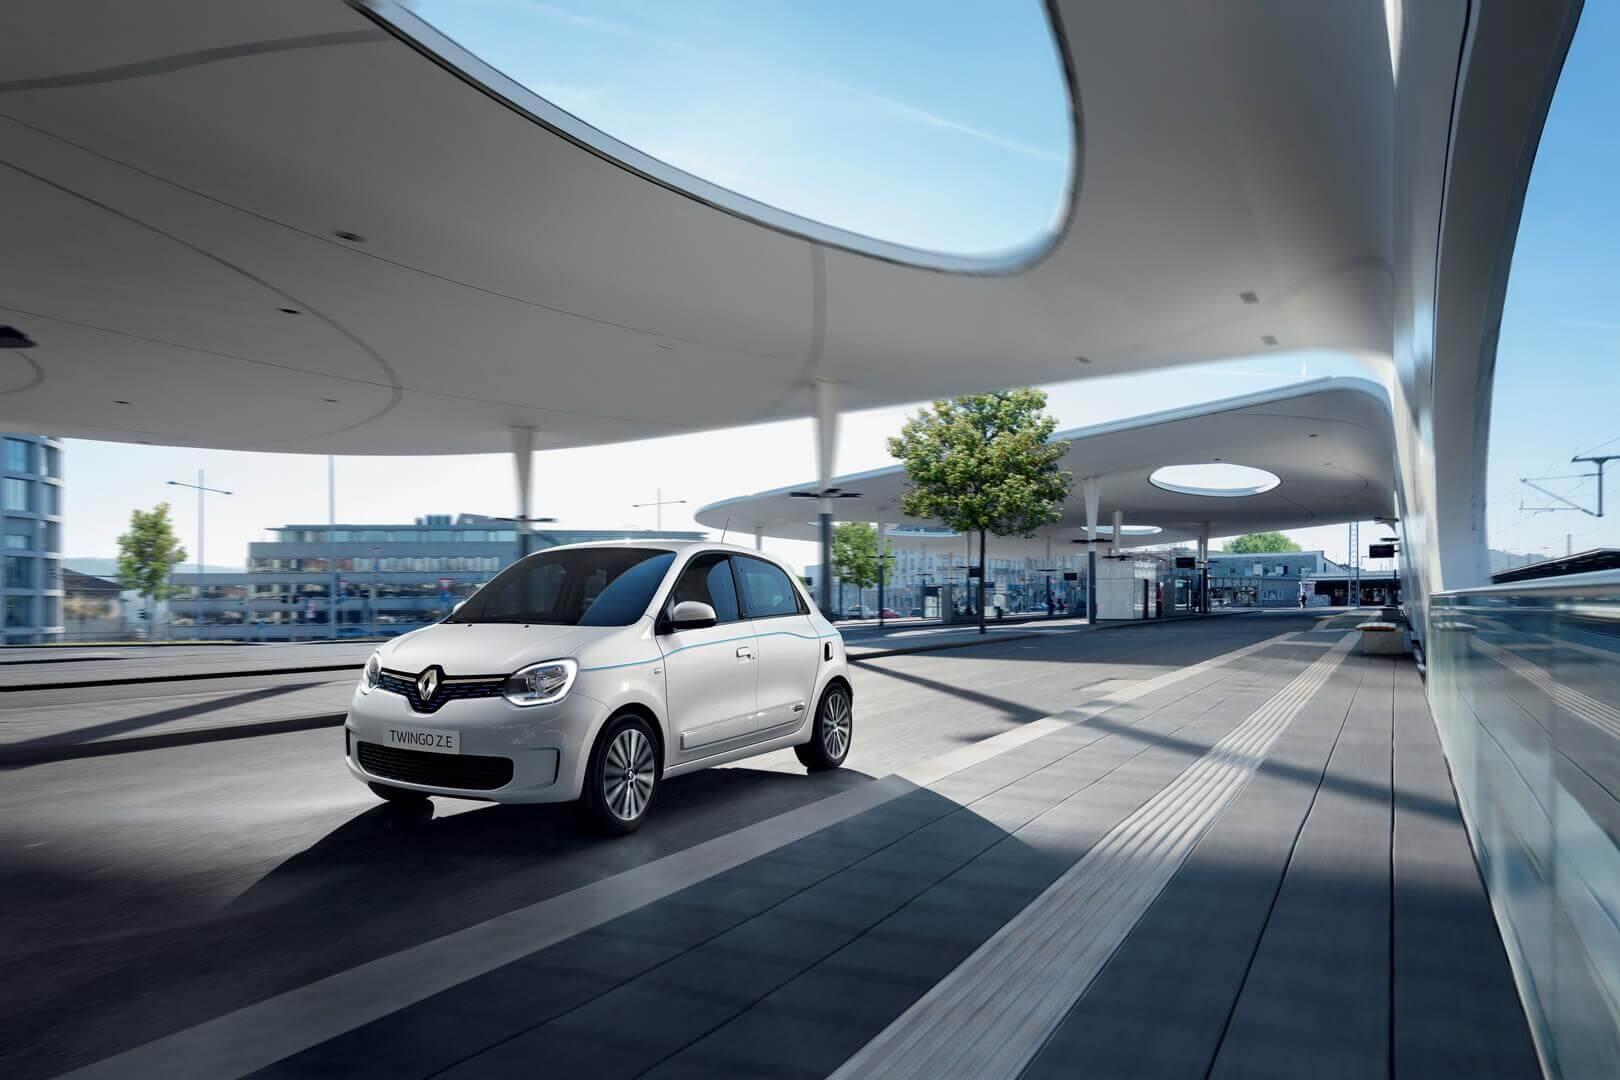 Фотография экоавто Renault Twingo Z.E. - фото 11